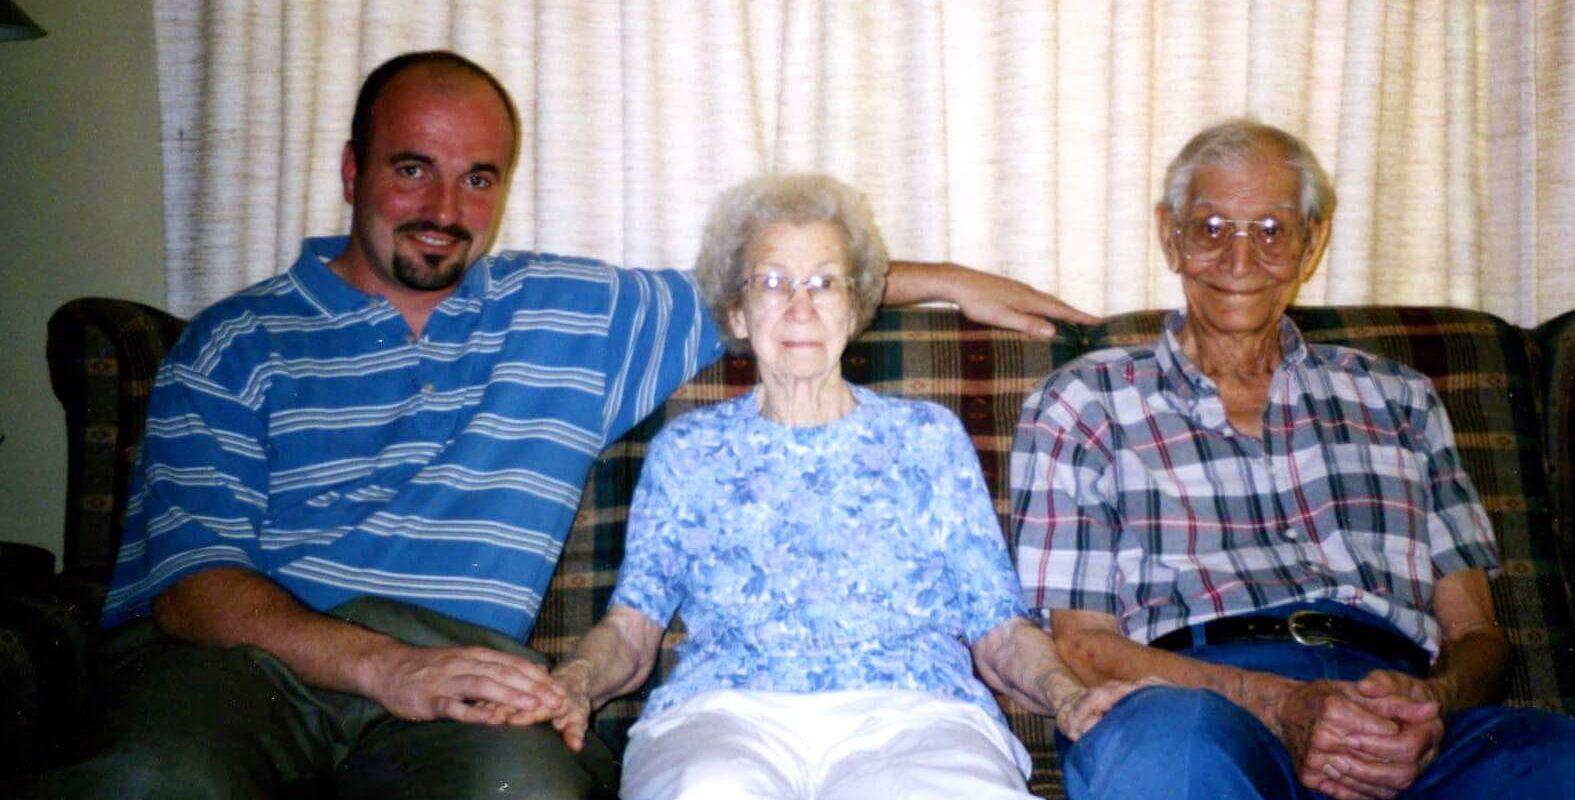 Jason with Grandma and Gramps (Ken & Hazel Hobbs)